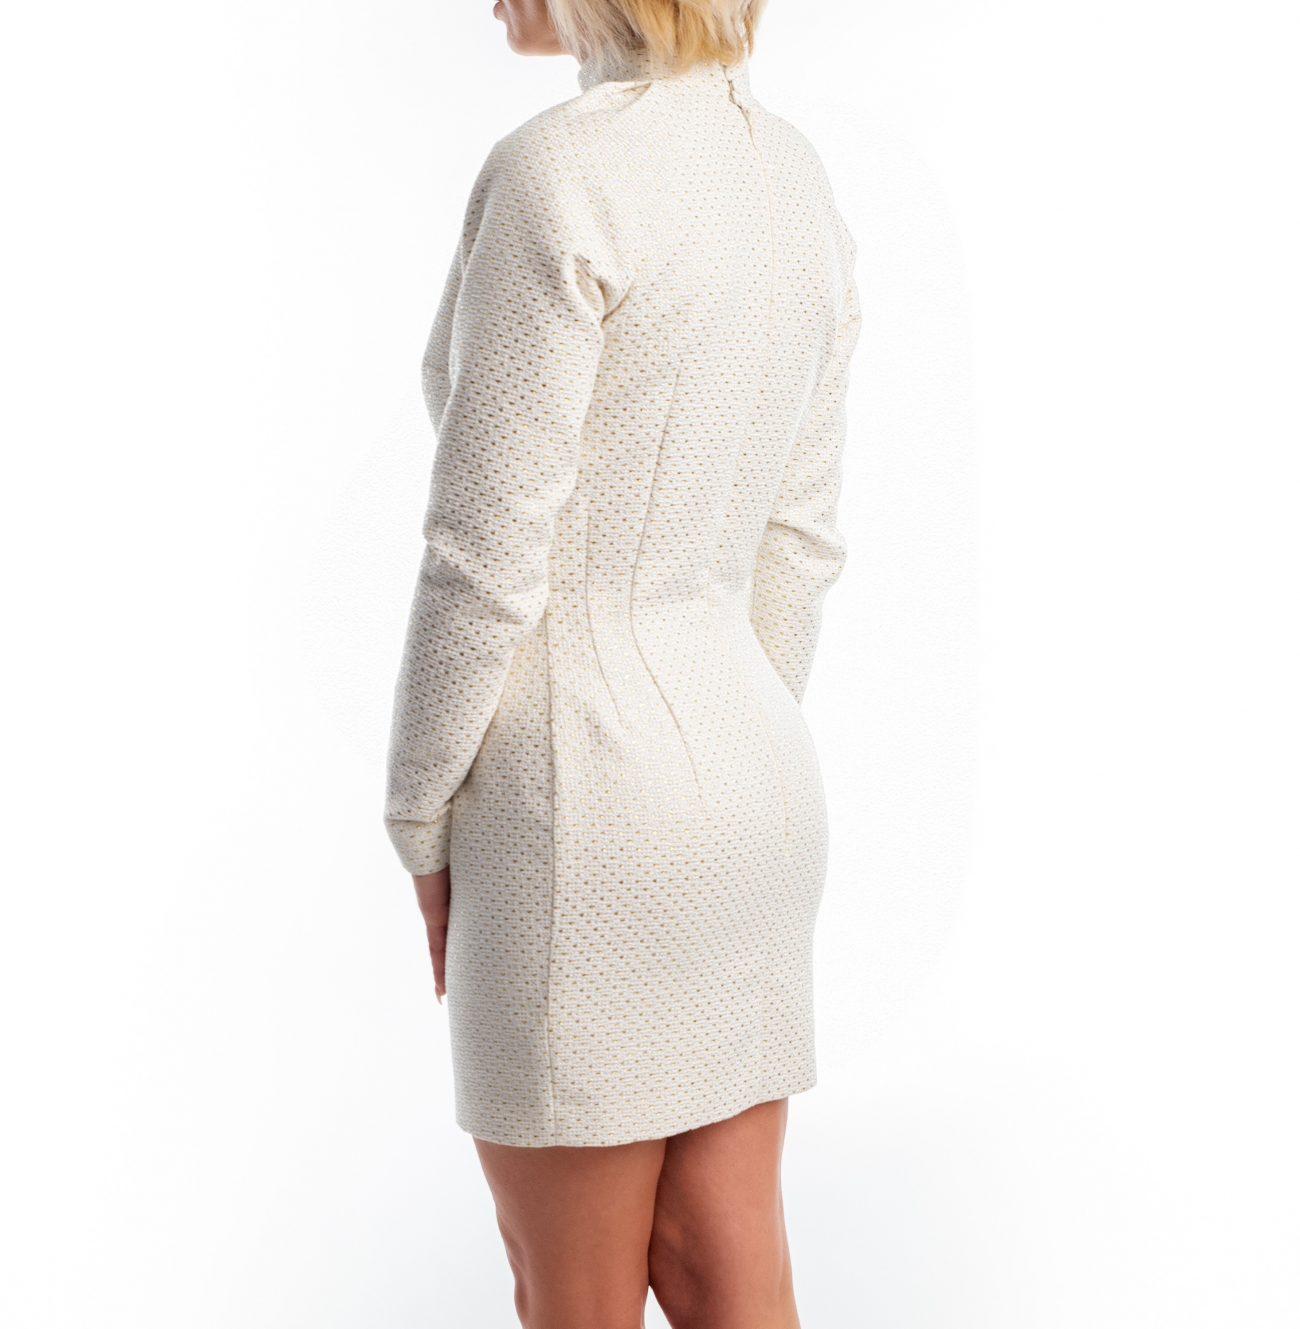 Rochie Eliza - rochie din brocard alb cu auriu | Essalian.com - Email: office@essalian.com | 0744957107 | Bucuresti